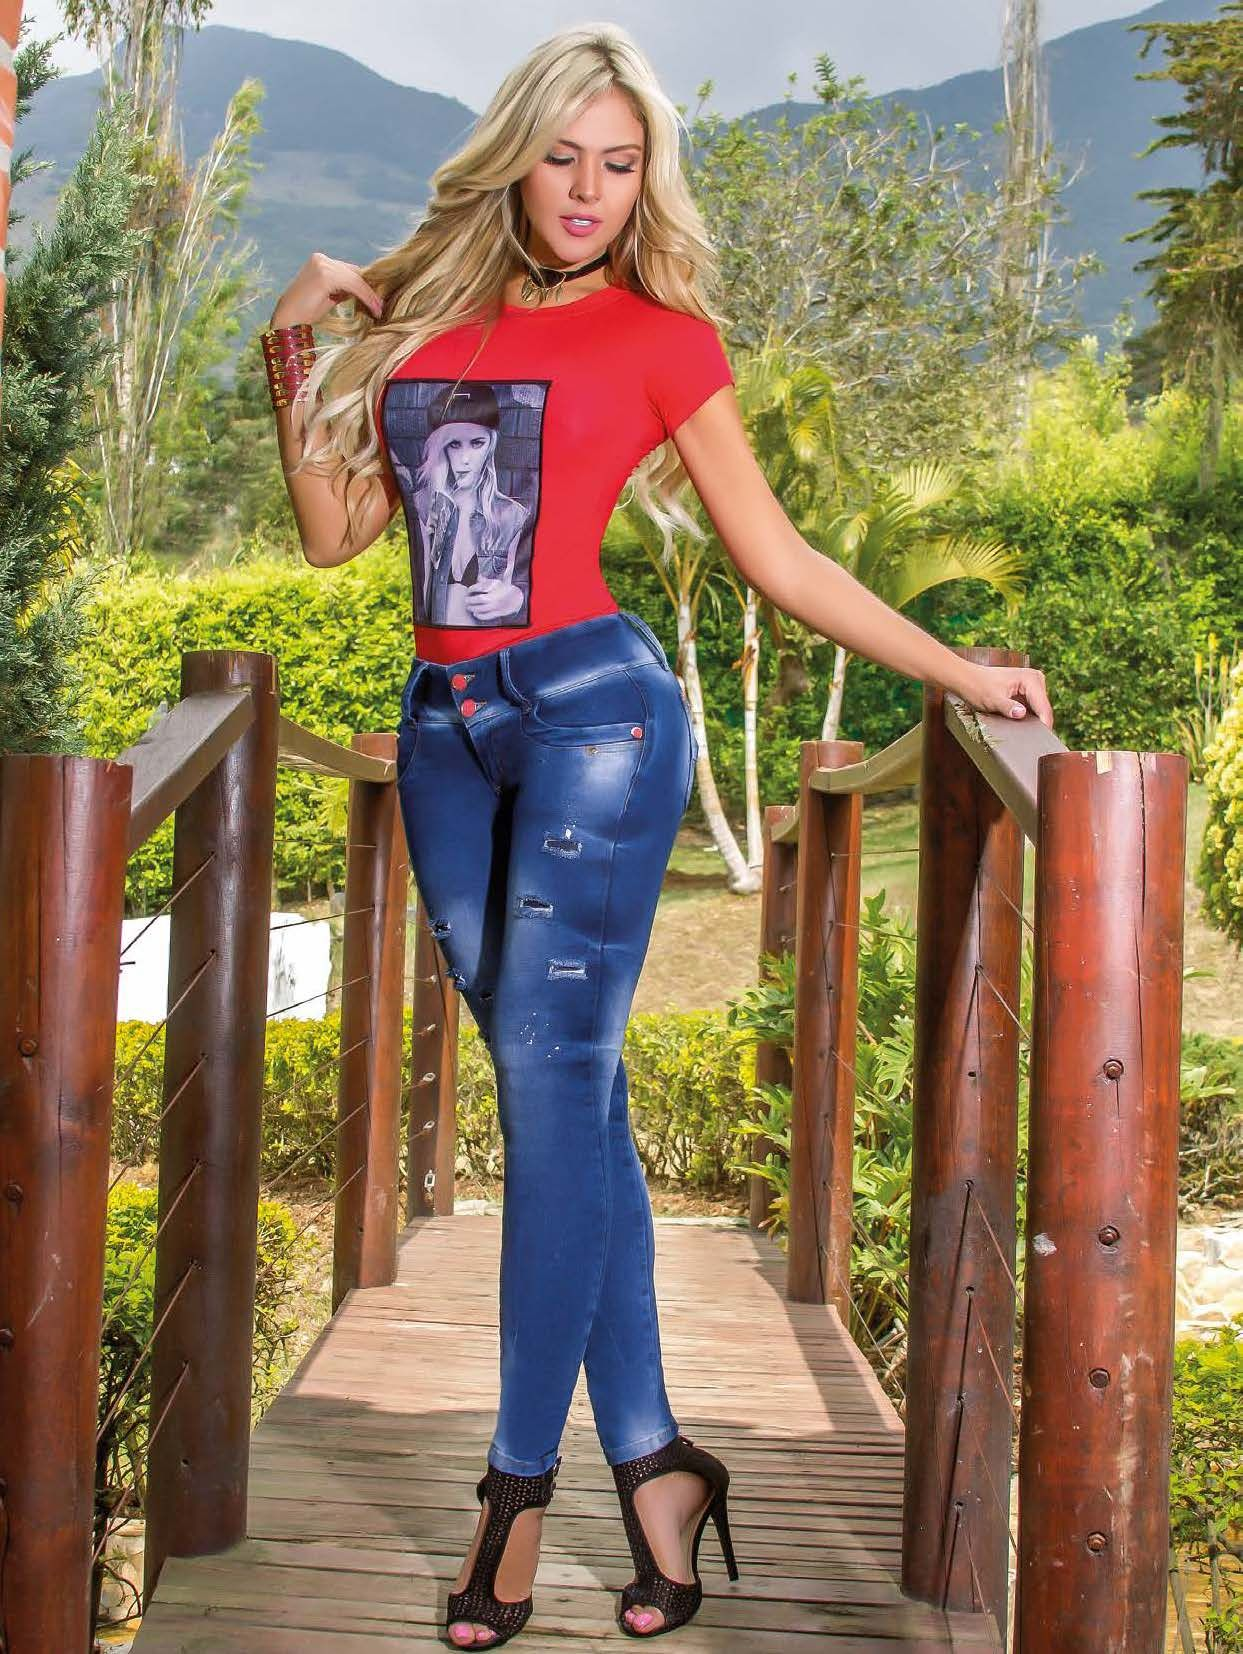 32a6698ce2 Jeans ventas online precios de fabrica  fashion  style  jeans   jeanscolombianos  moda  ropa  modacolombiana